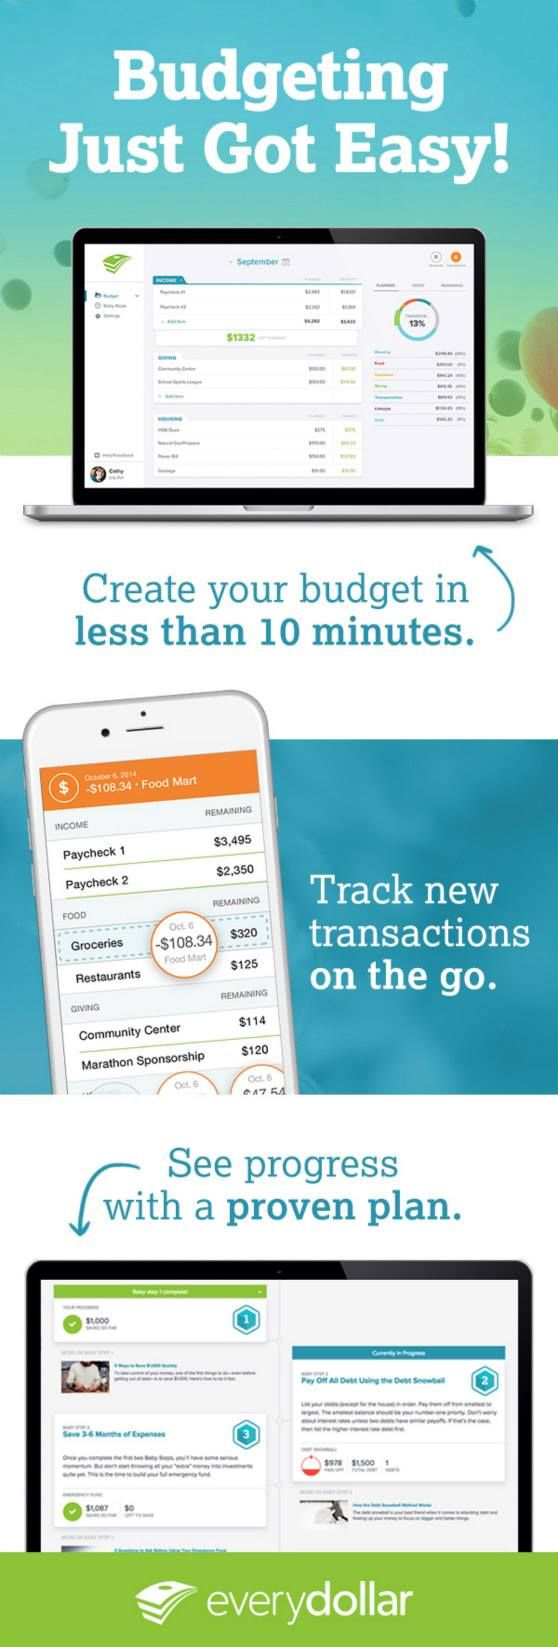 Best 25+ Budget maker ideas on Pinterest | Online work at home ...